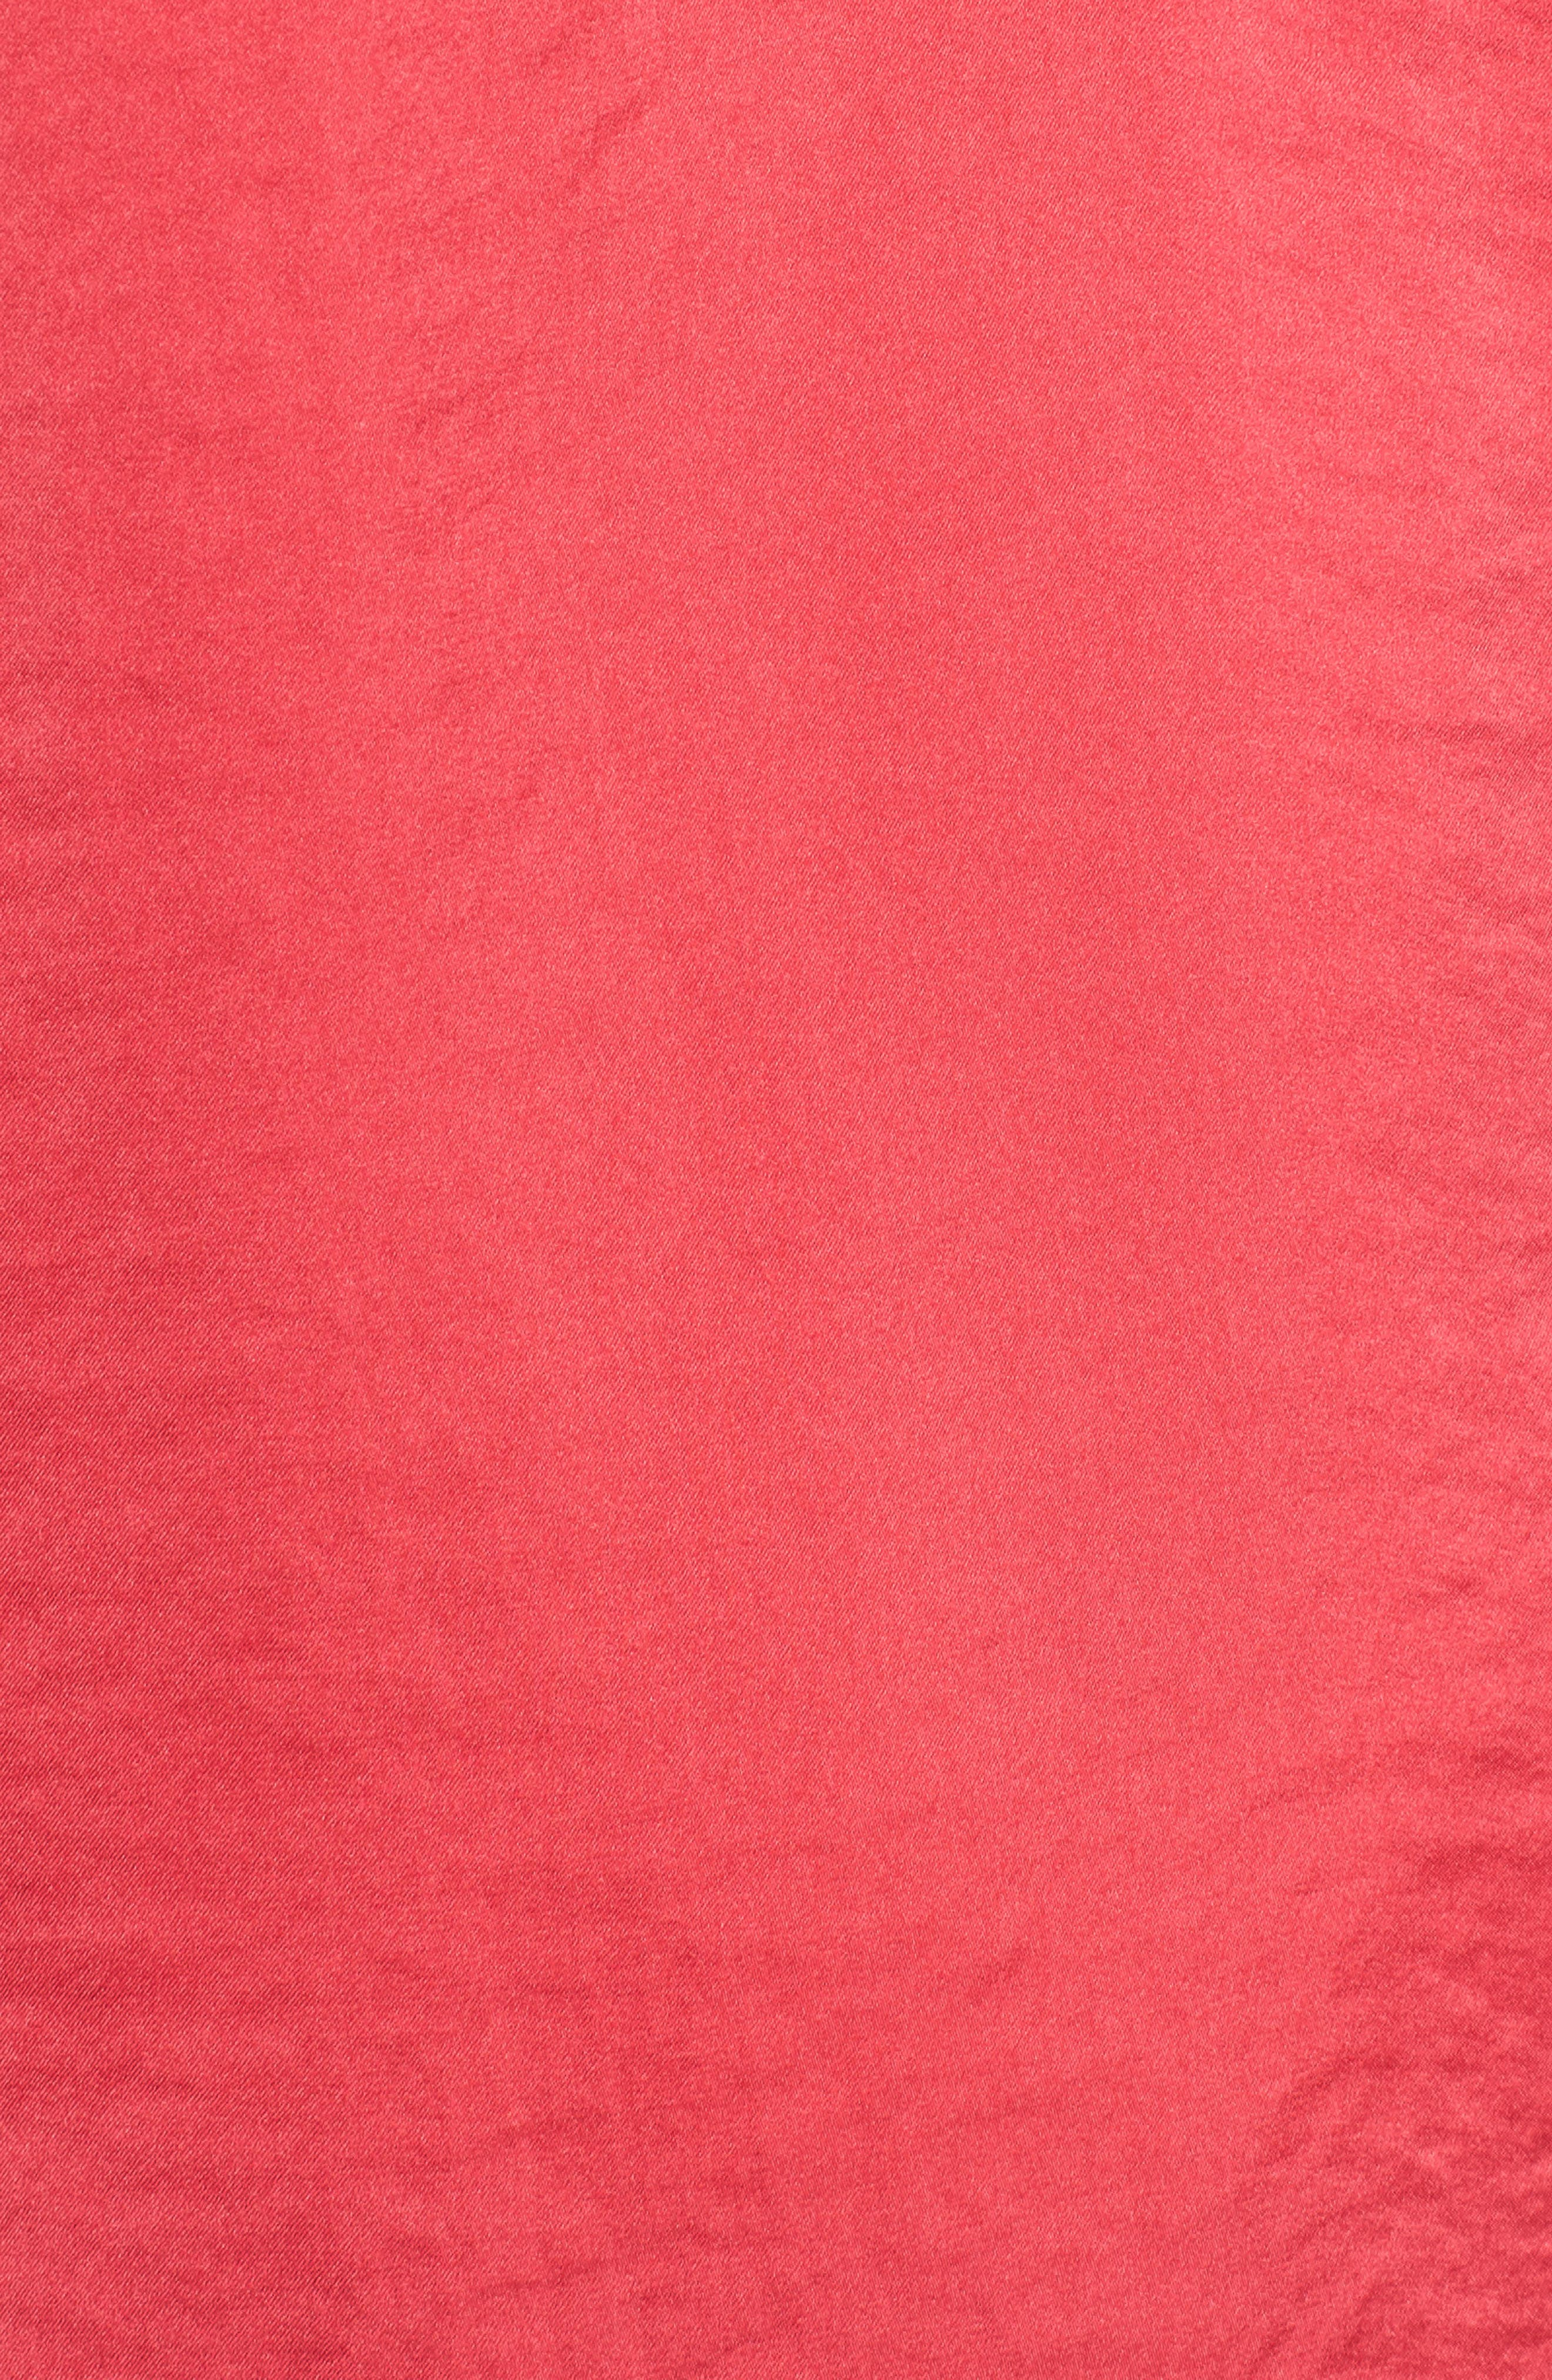 Lace Trim Satin Camisole,                             Alternate thumbnail 6, color,                             Pink Rose